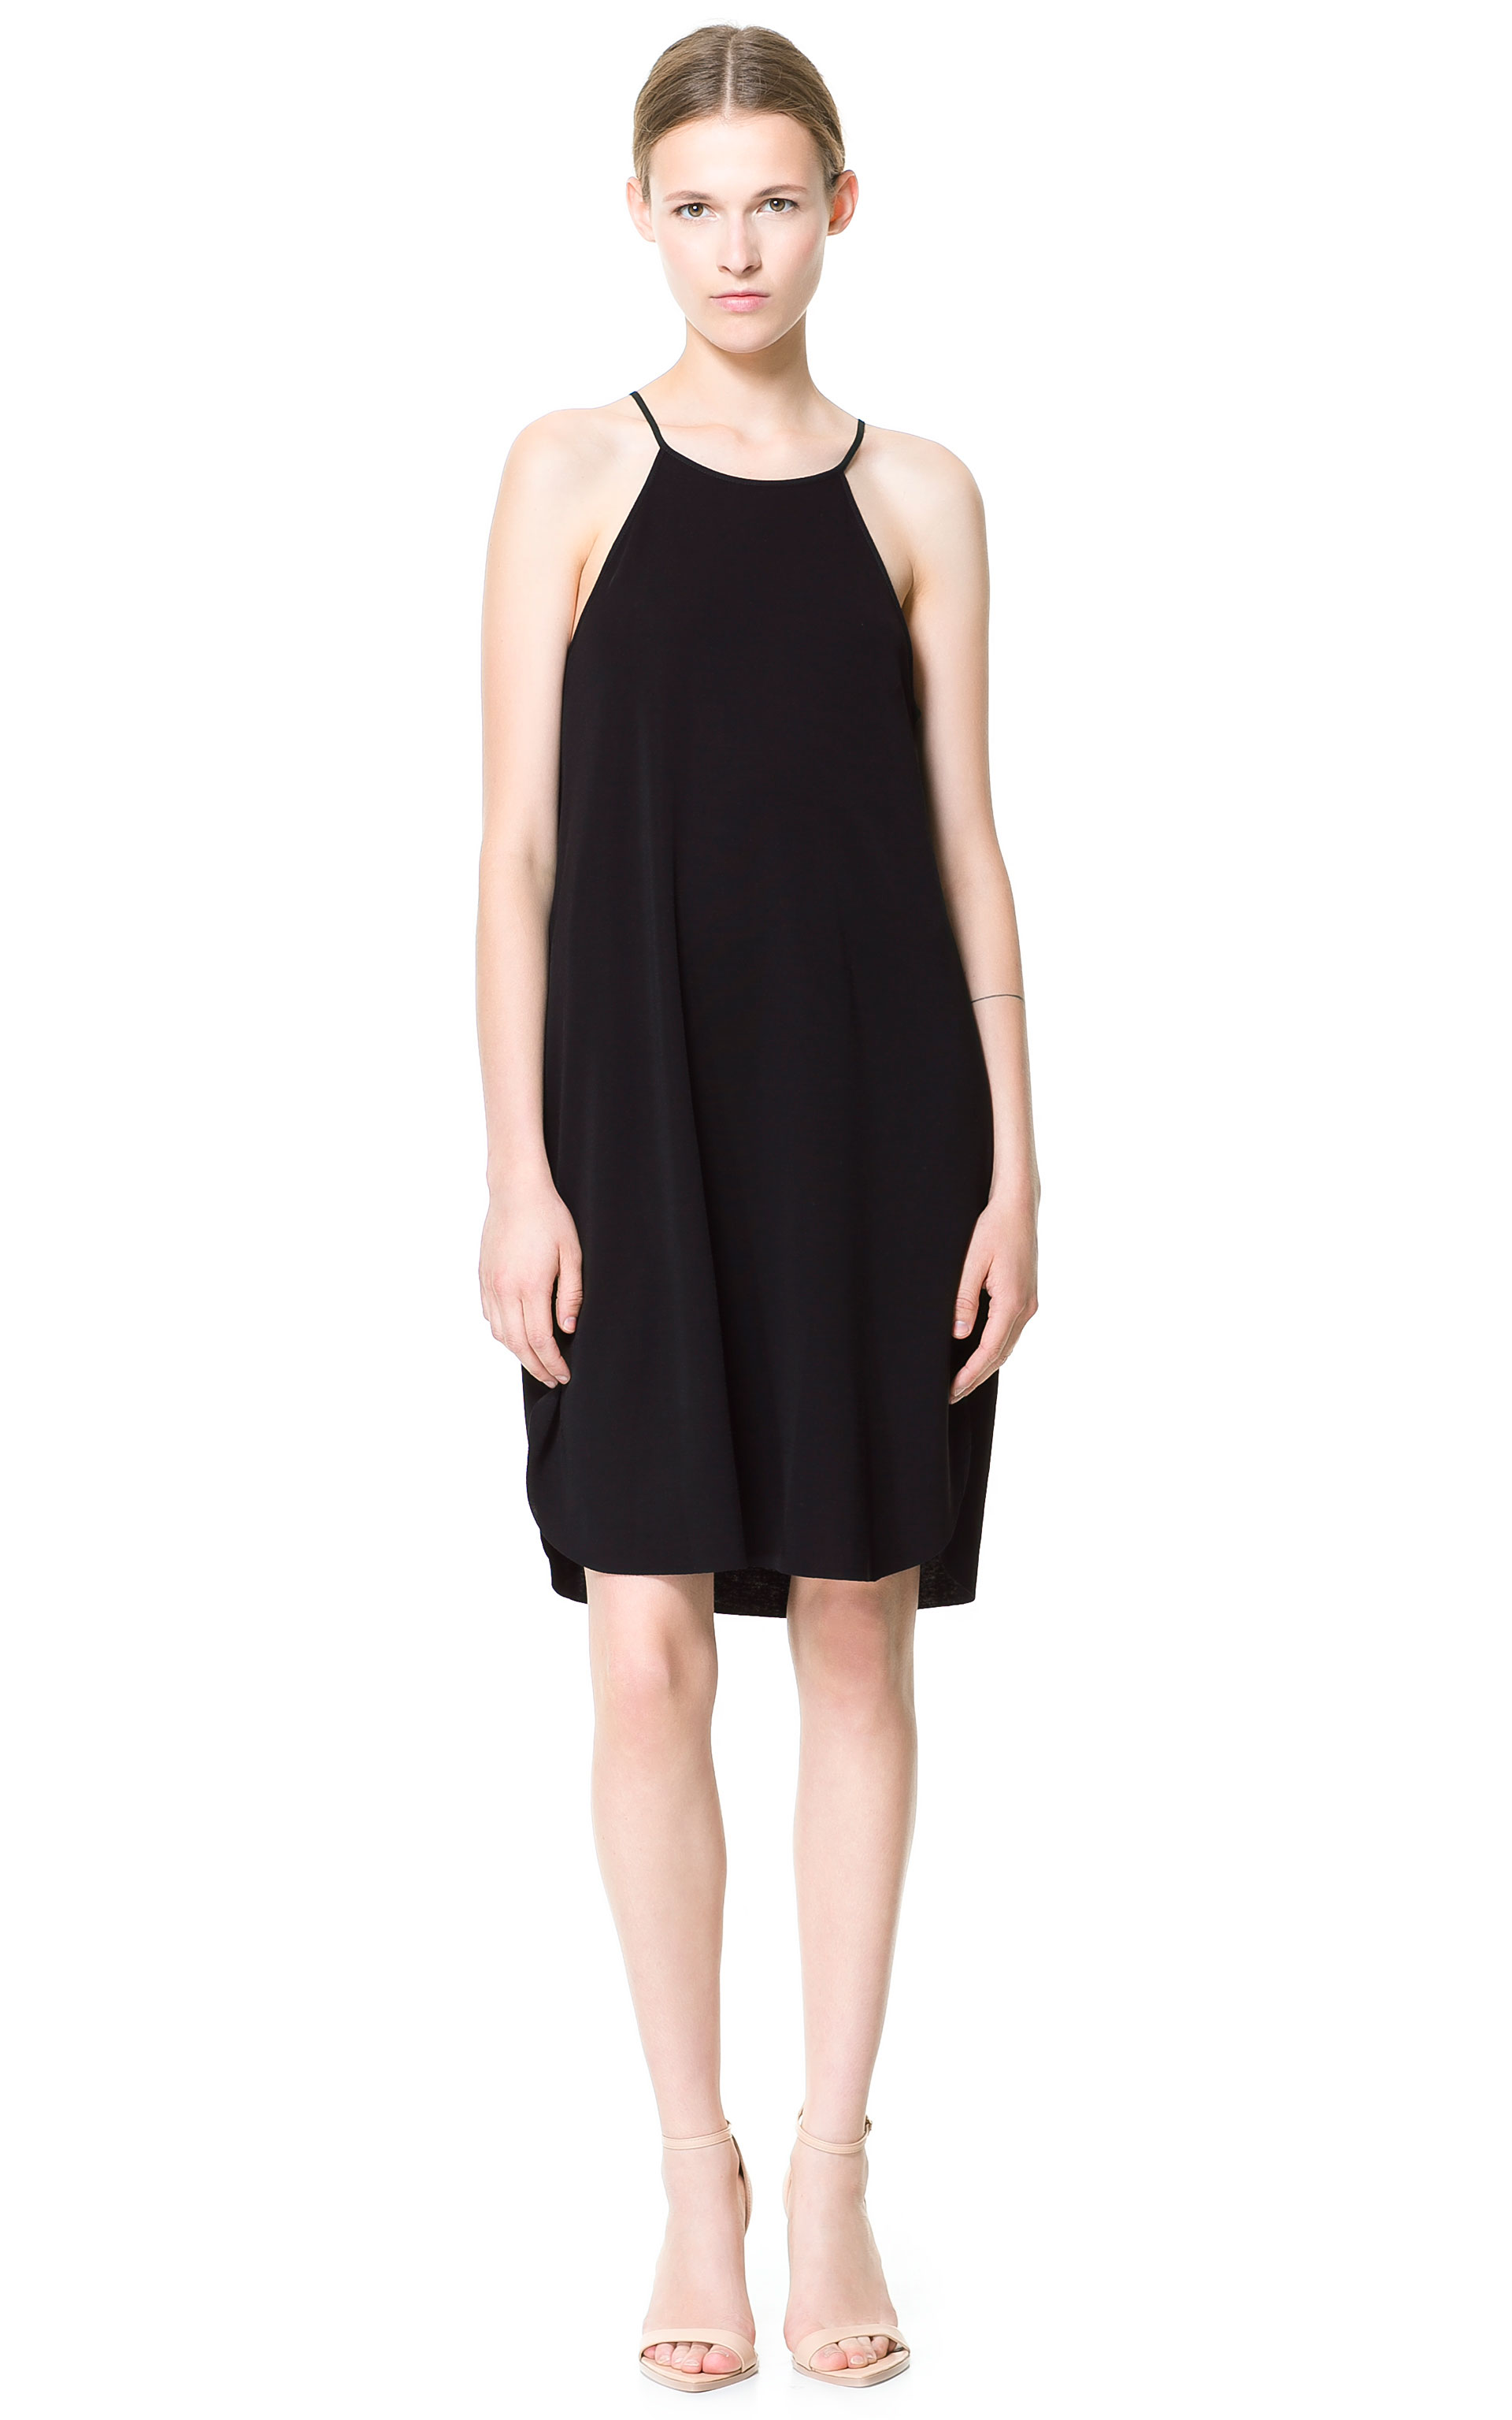 Zara Halter Neck Dress in Black | Lyst